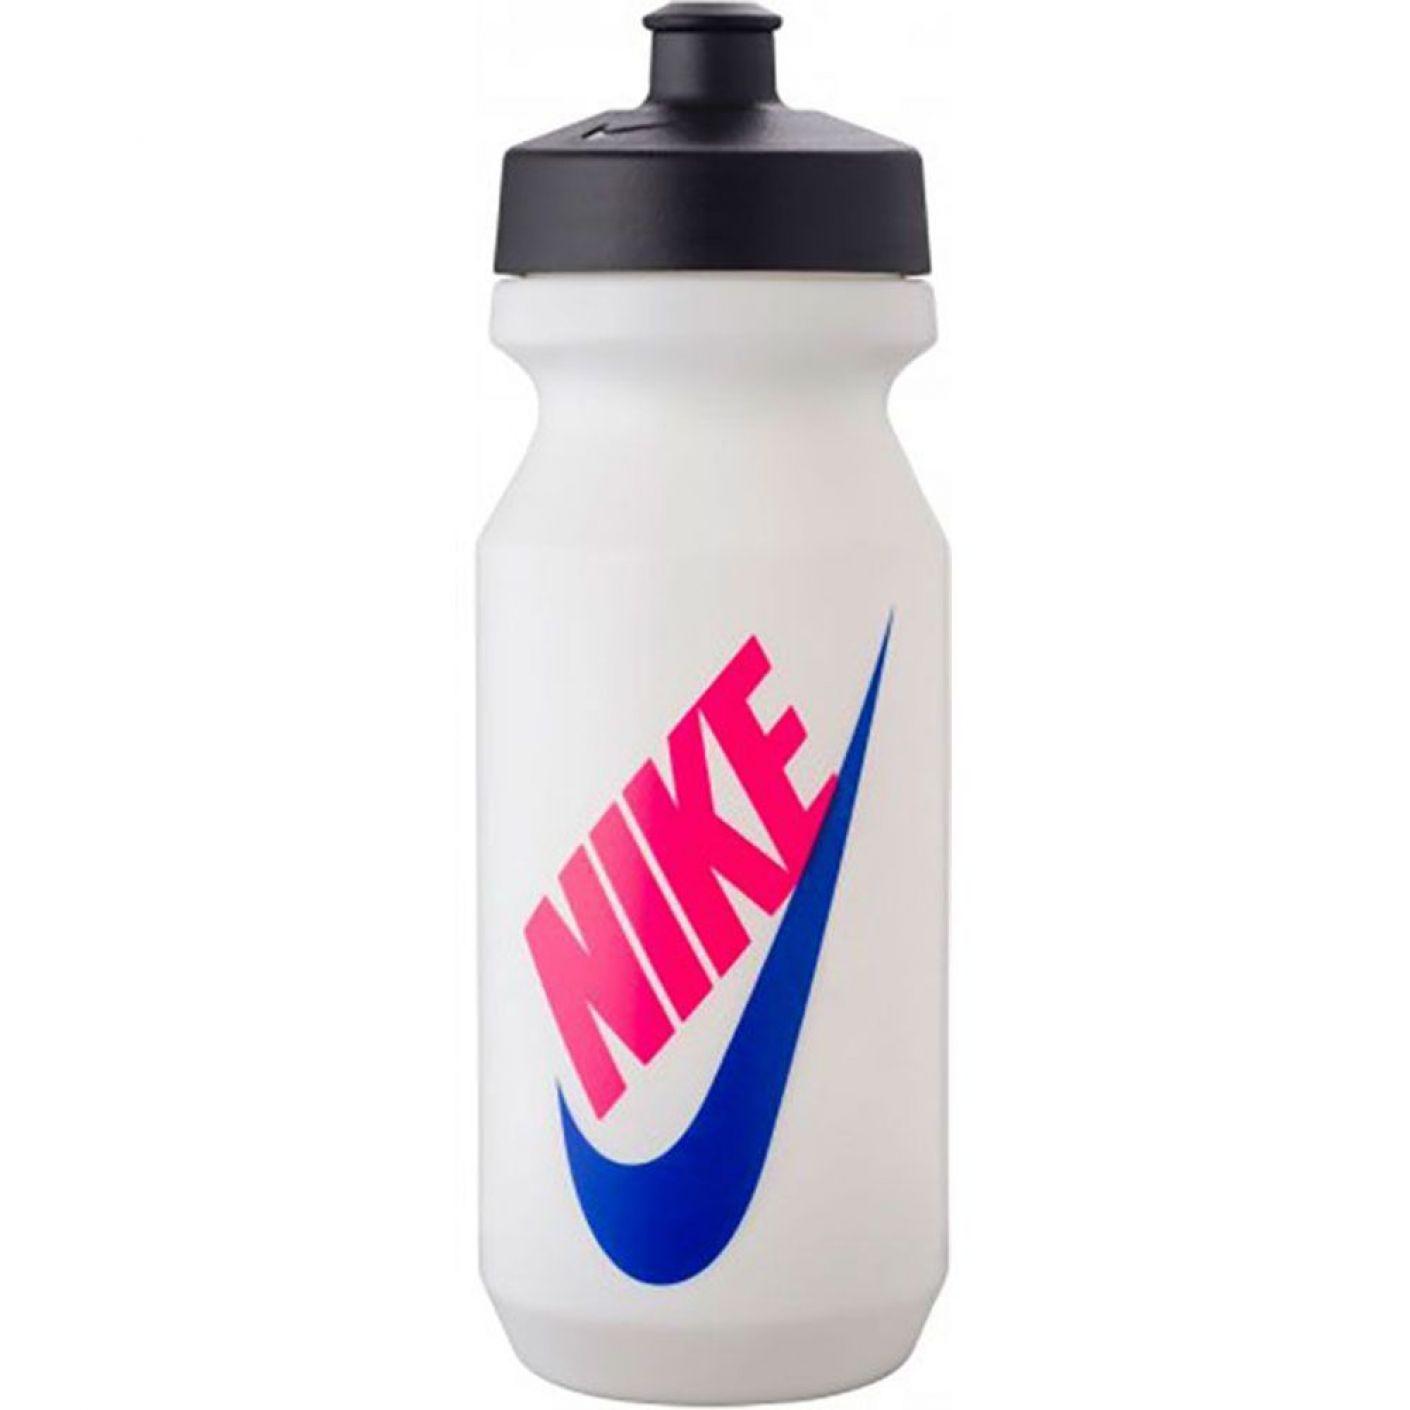 Nike Bidon Big Mouth SW Graphic 2.0 650 ML Wit Zwart Roze Blauw